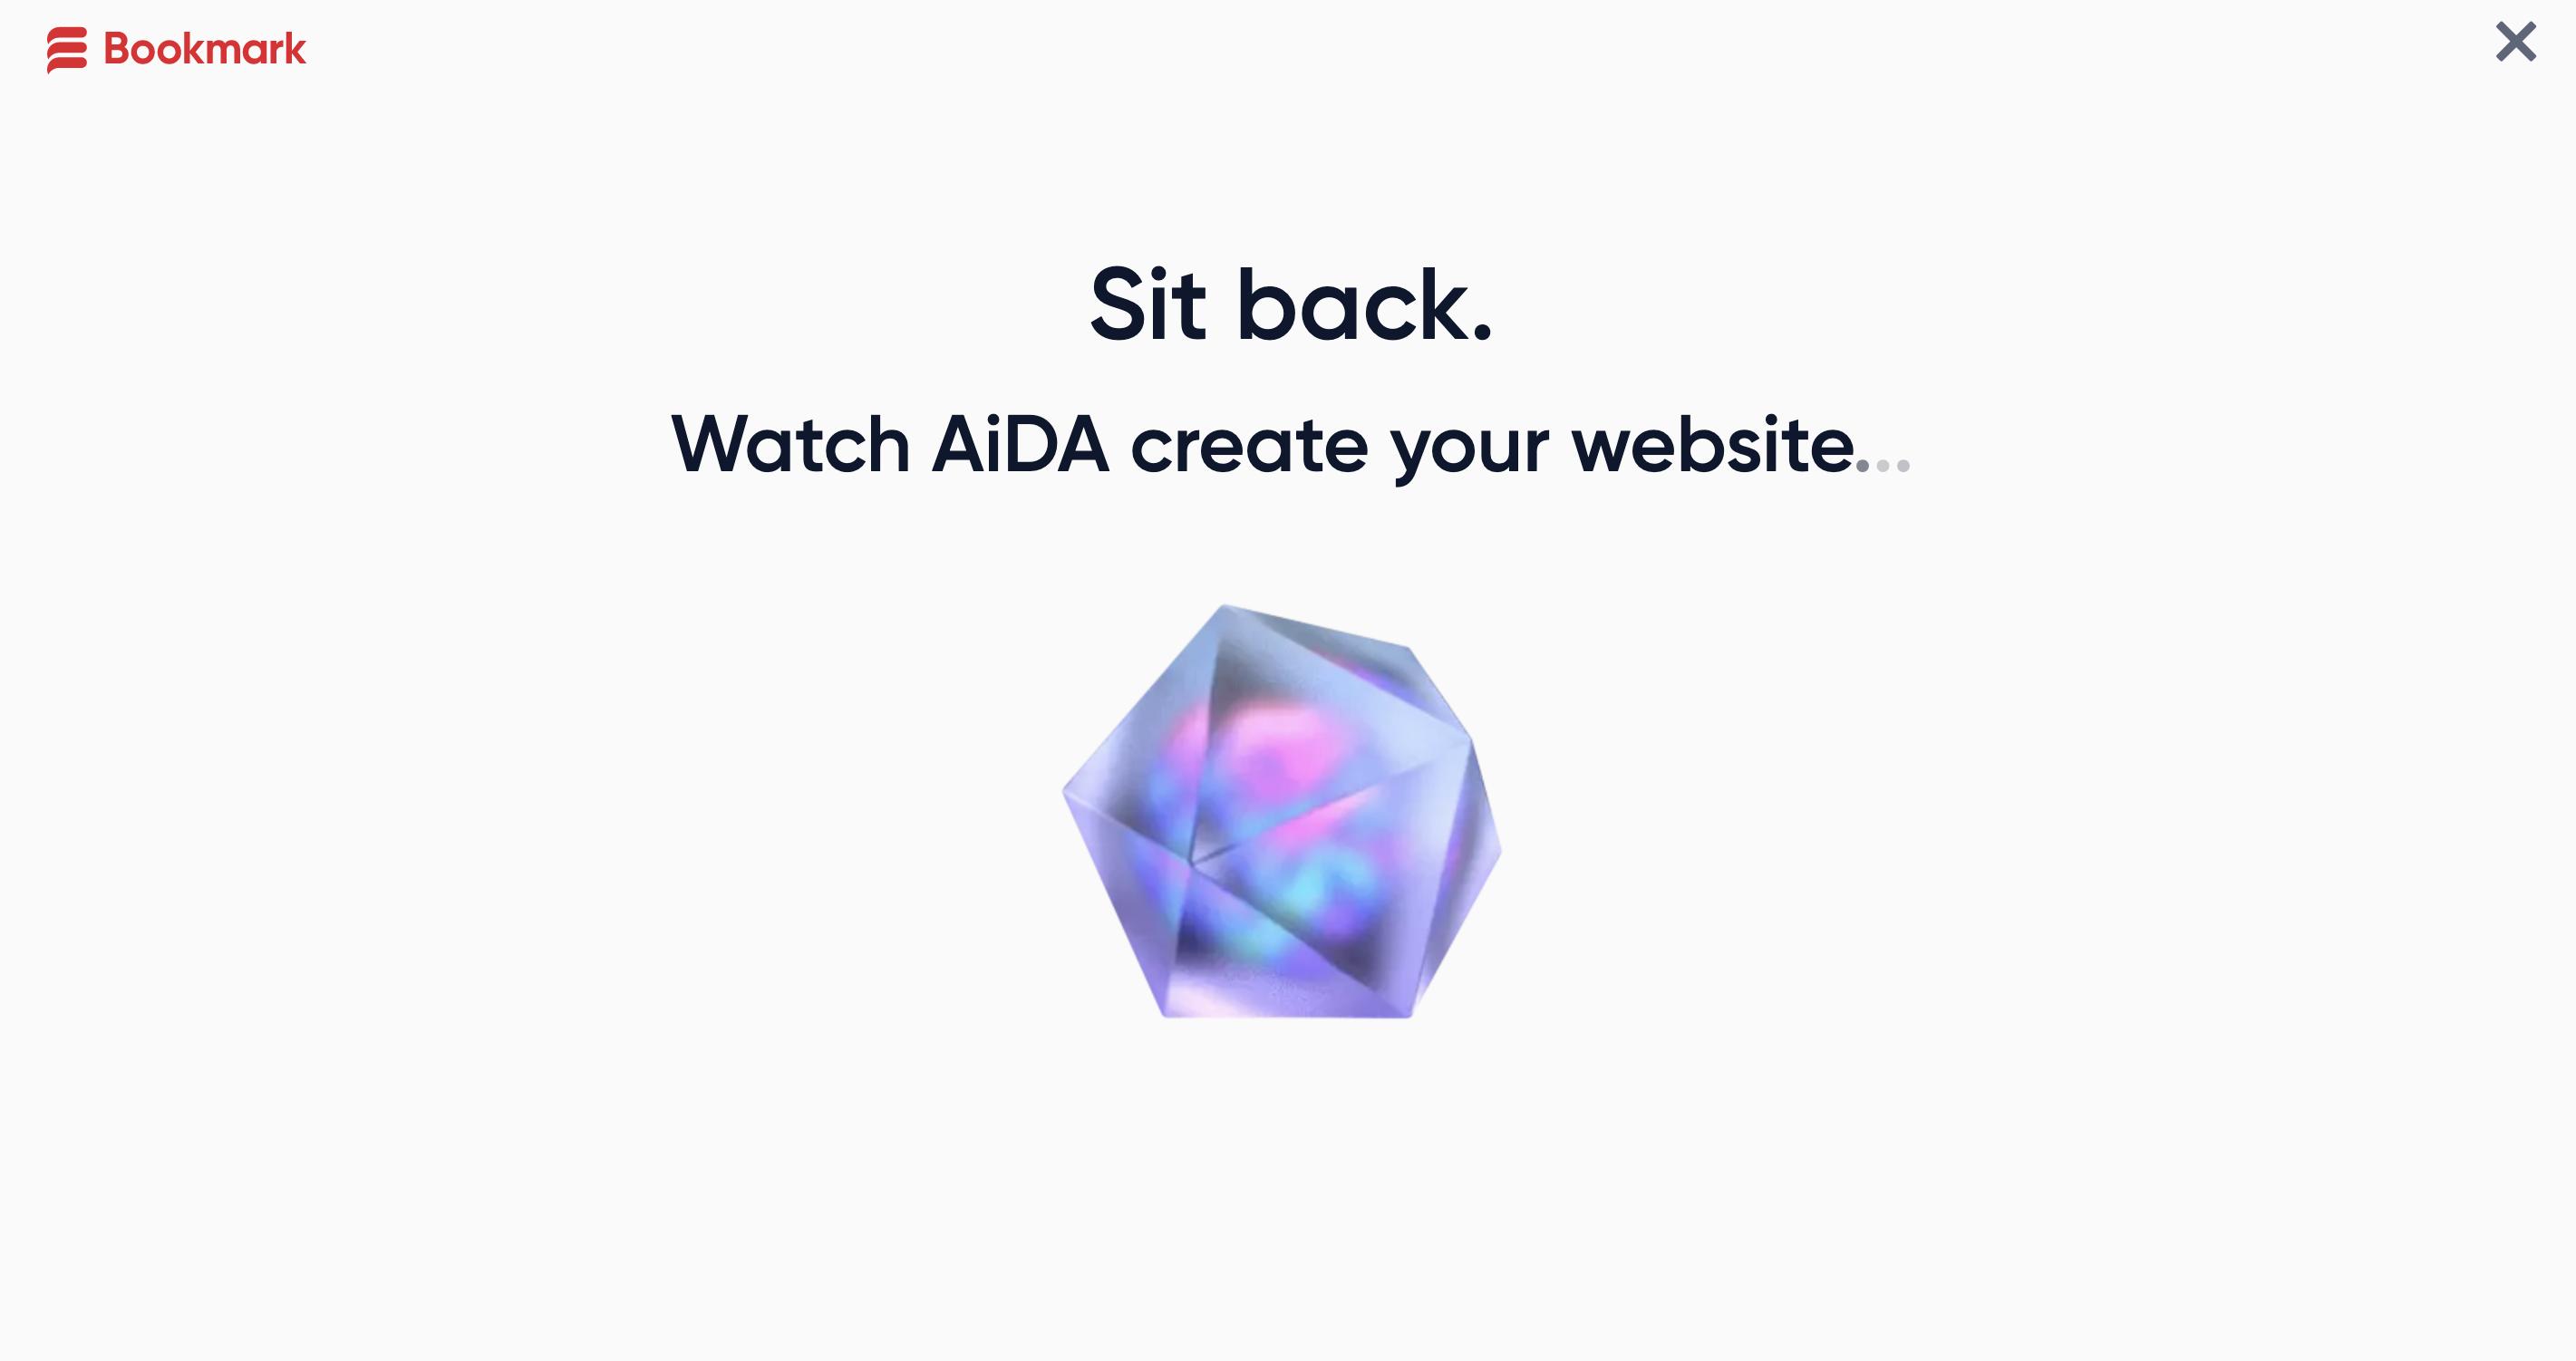 AiDA creates your website